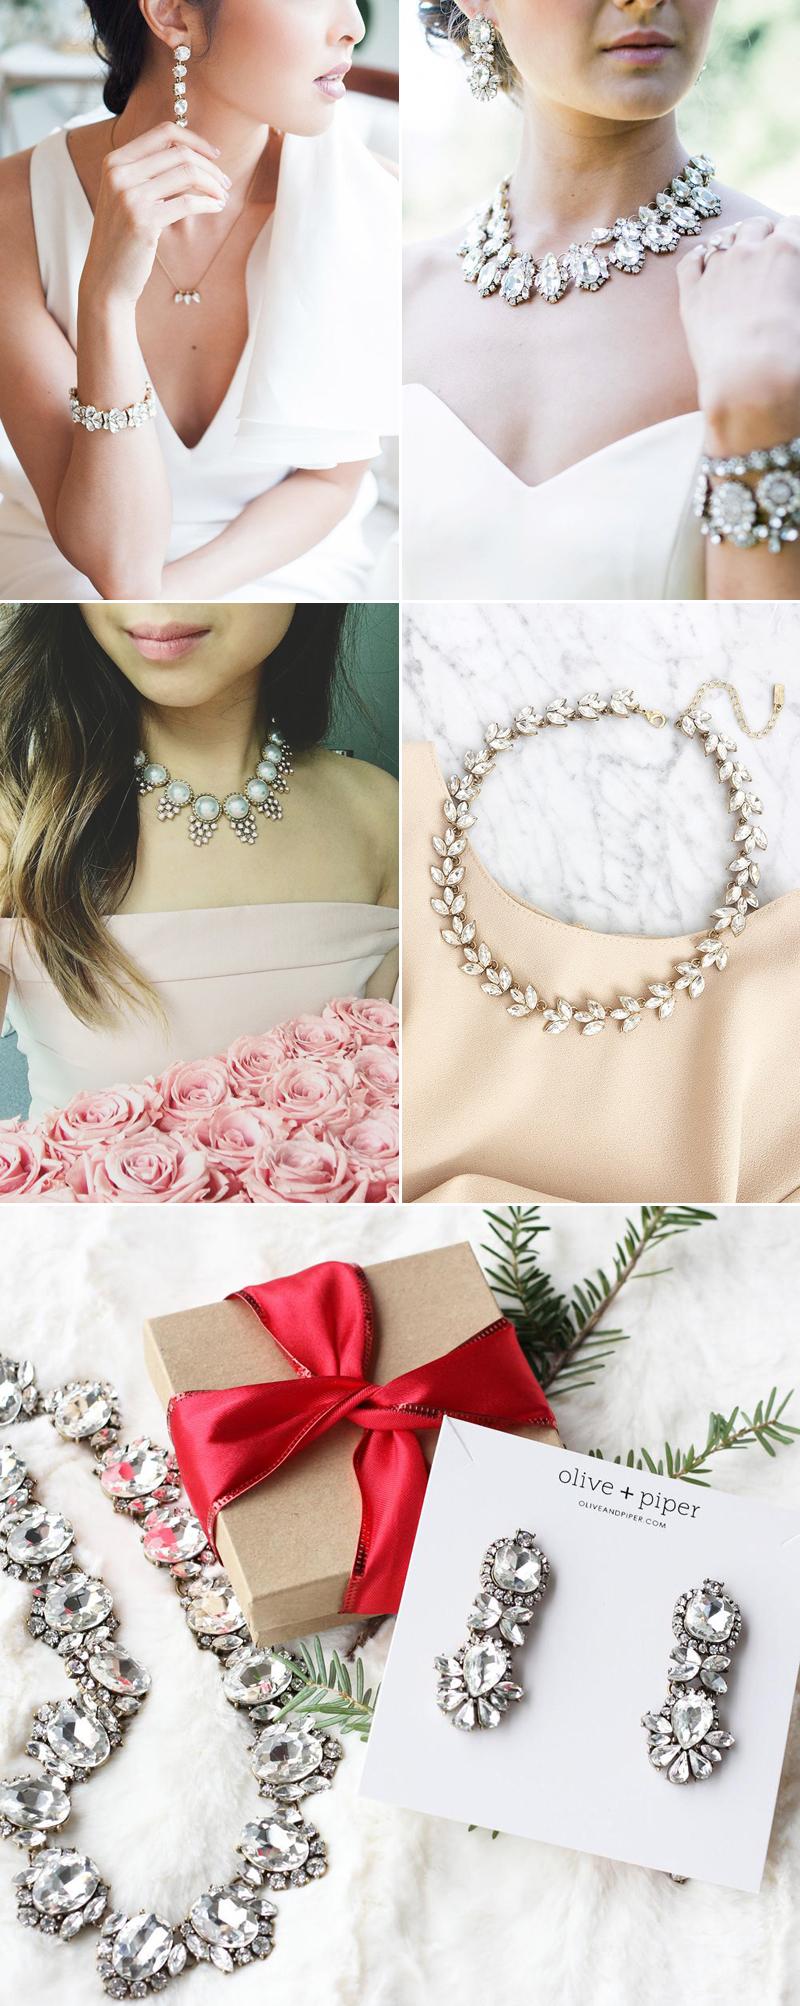 jewelry02-OliveandPiper